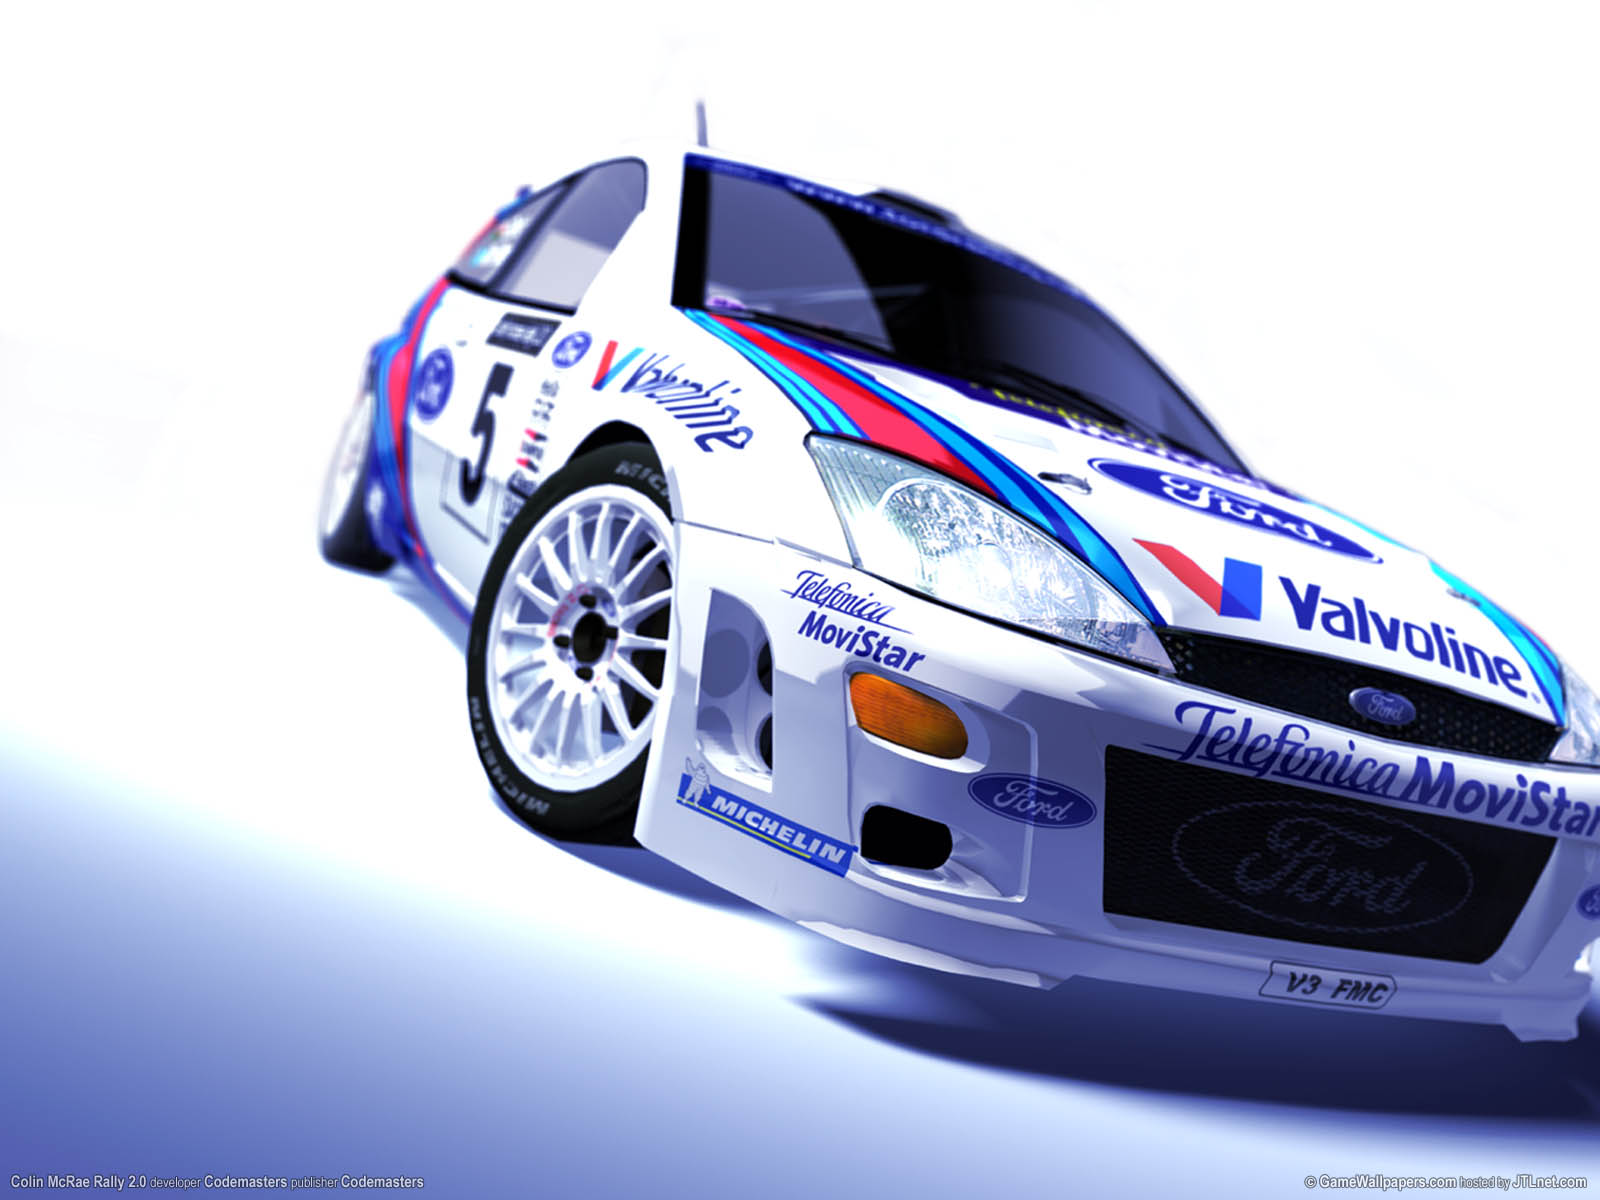 Colin McRae Rally 2.0 wallpaper 05 1600x1200